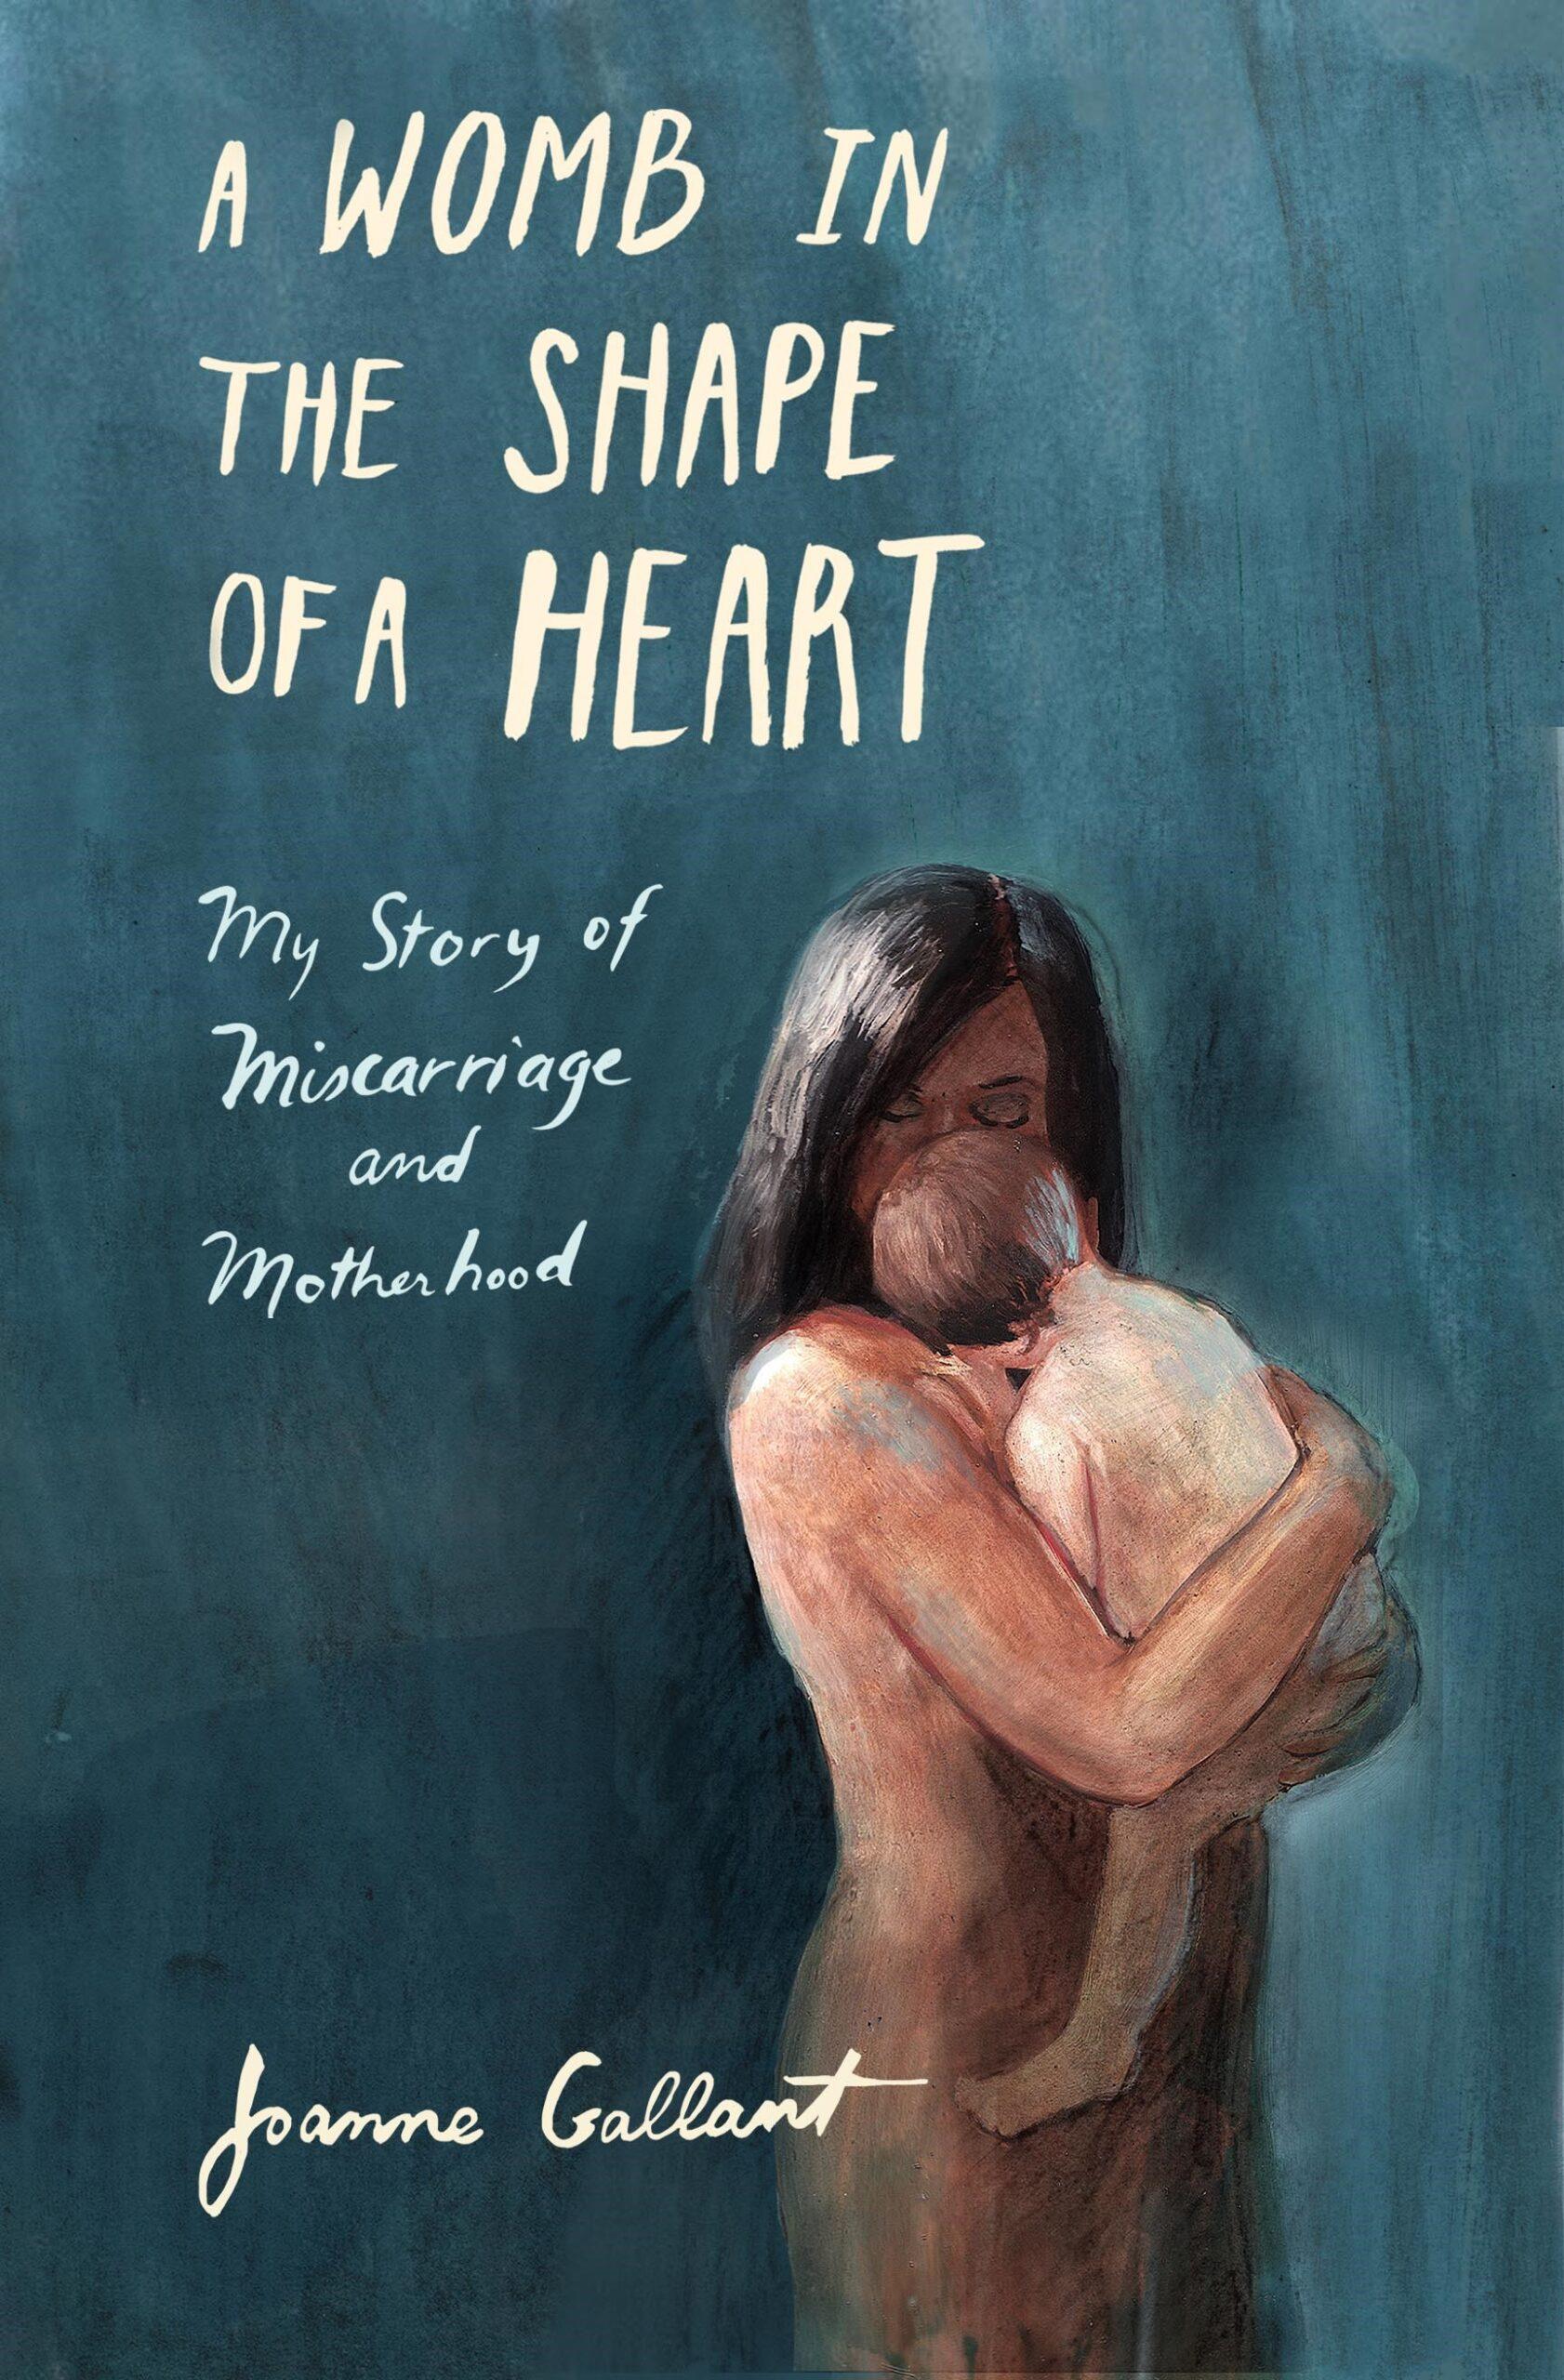 Staff Picks: 5 Fall Books Dealing With Trauma, Health & Healthcare